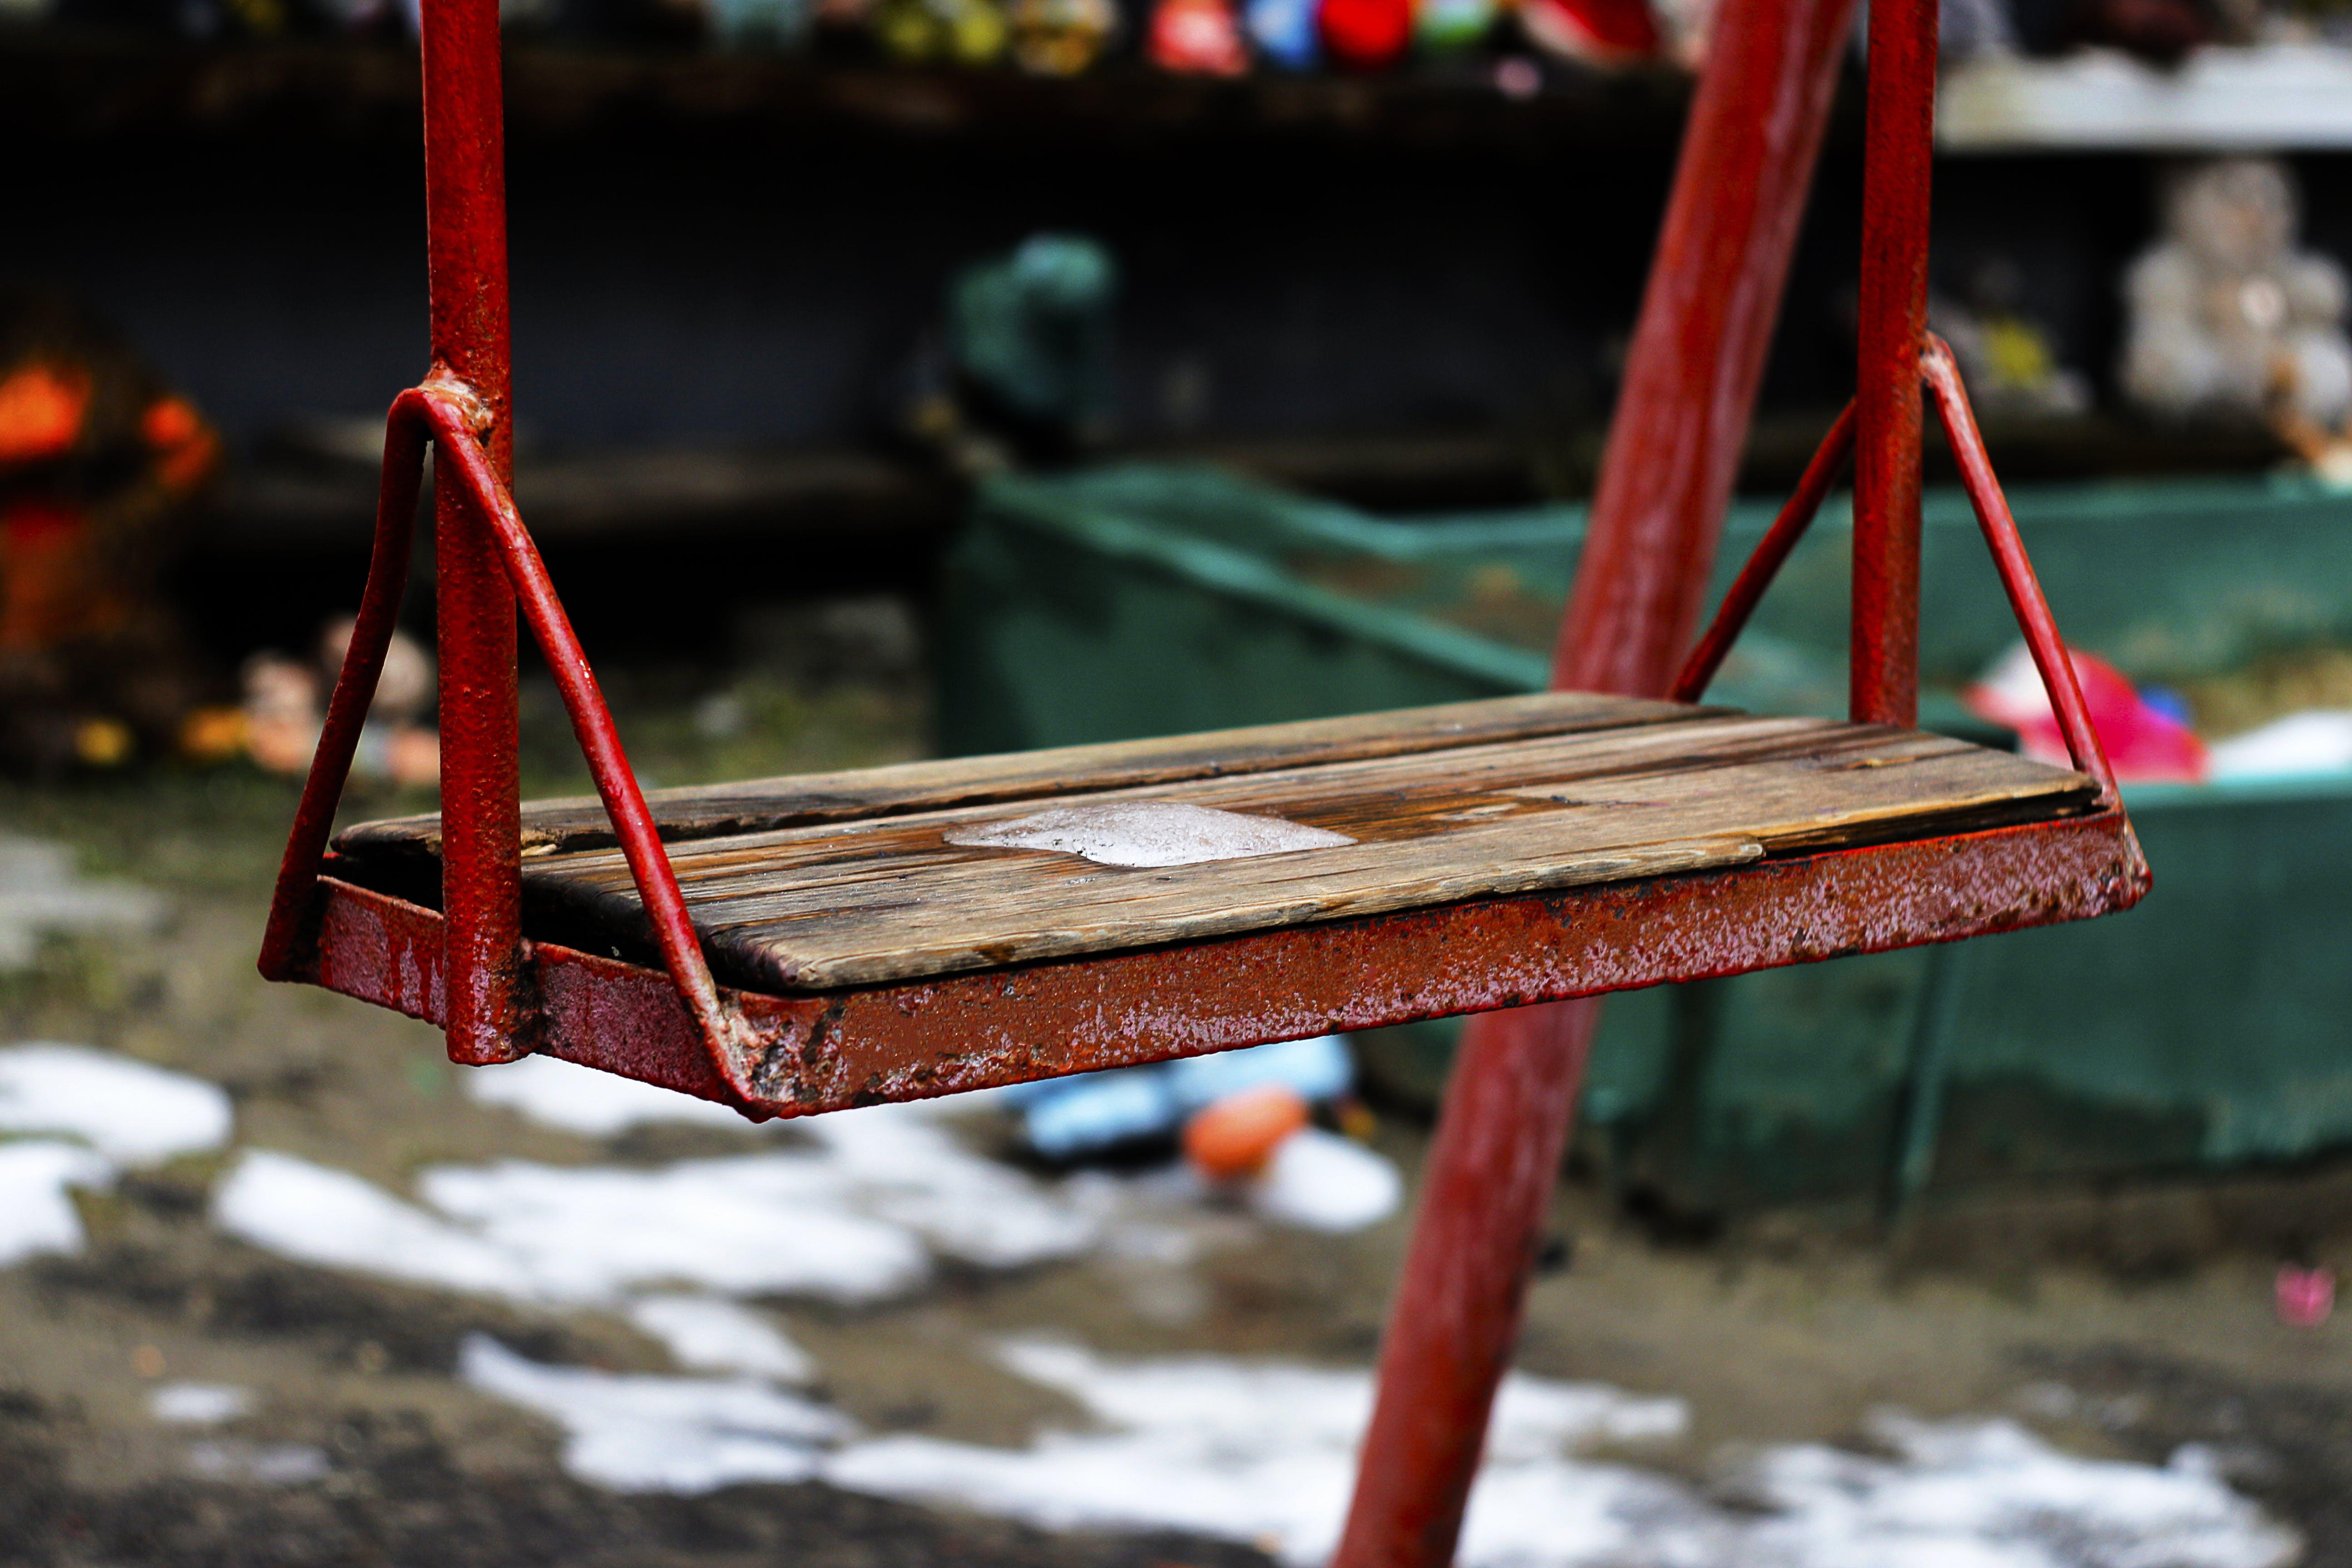 Free stock photo of metal, blur, rustic, chair